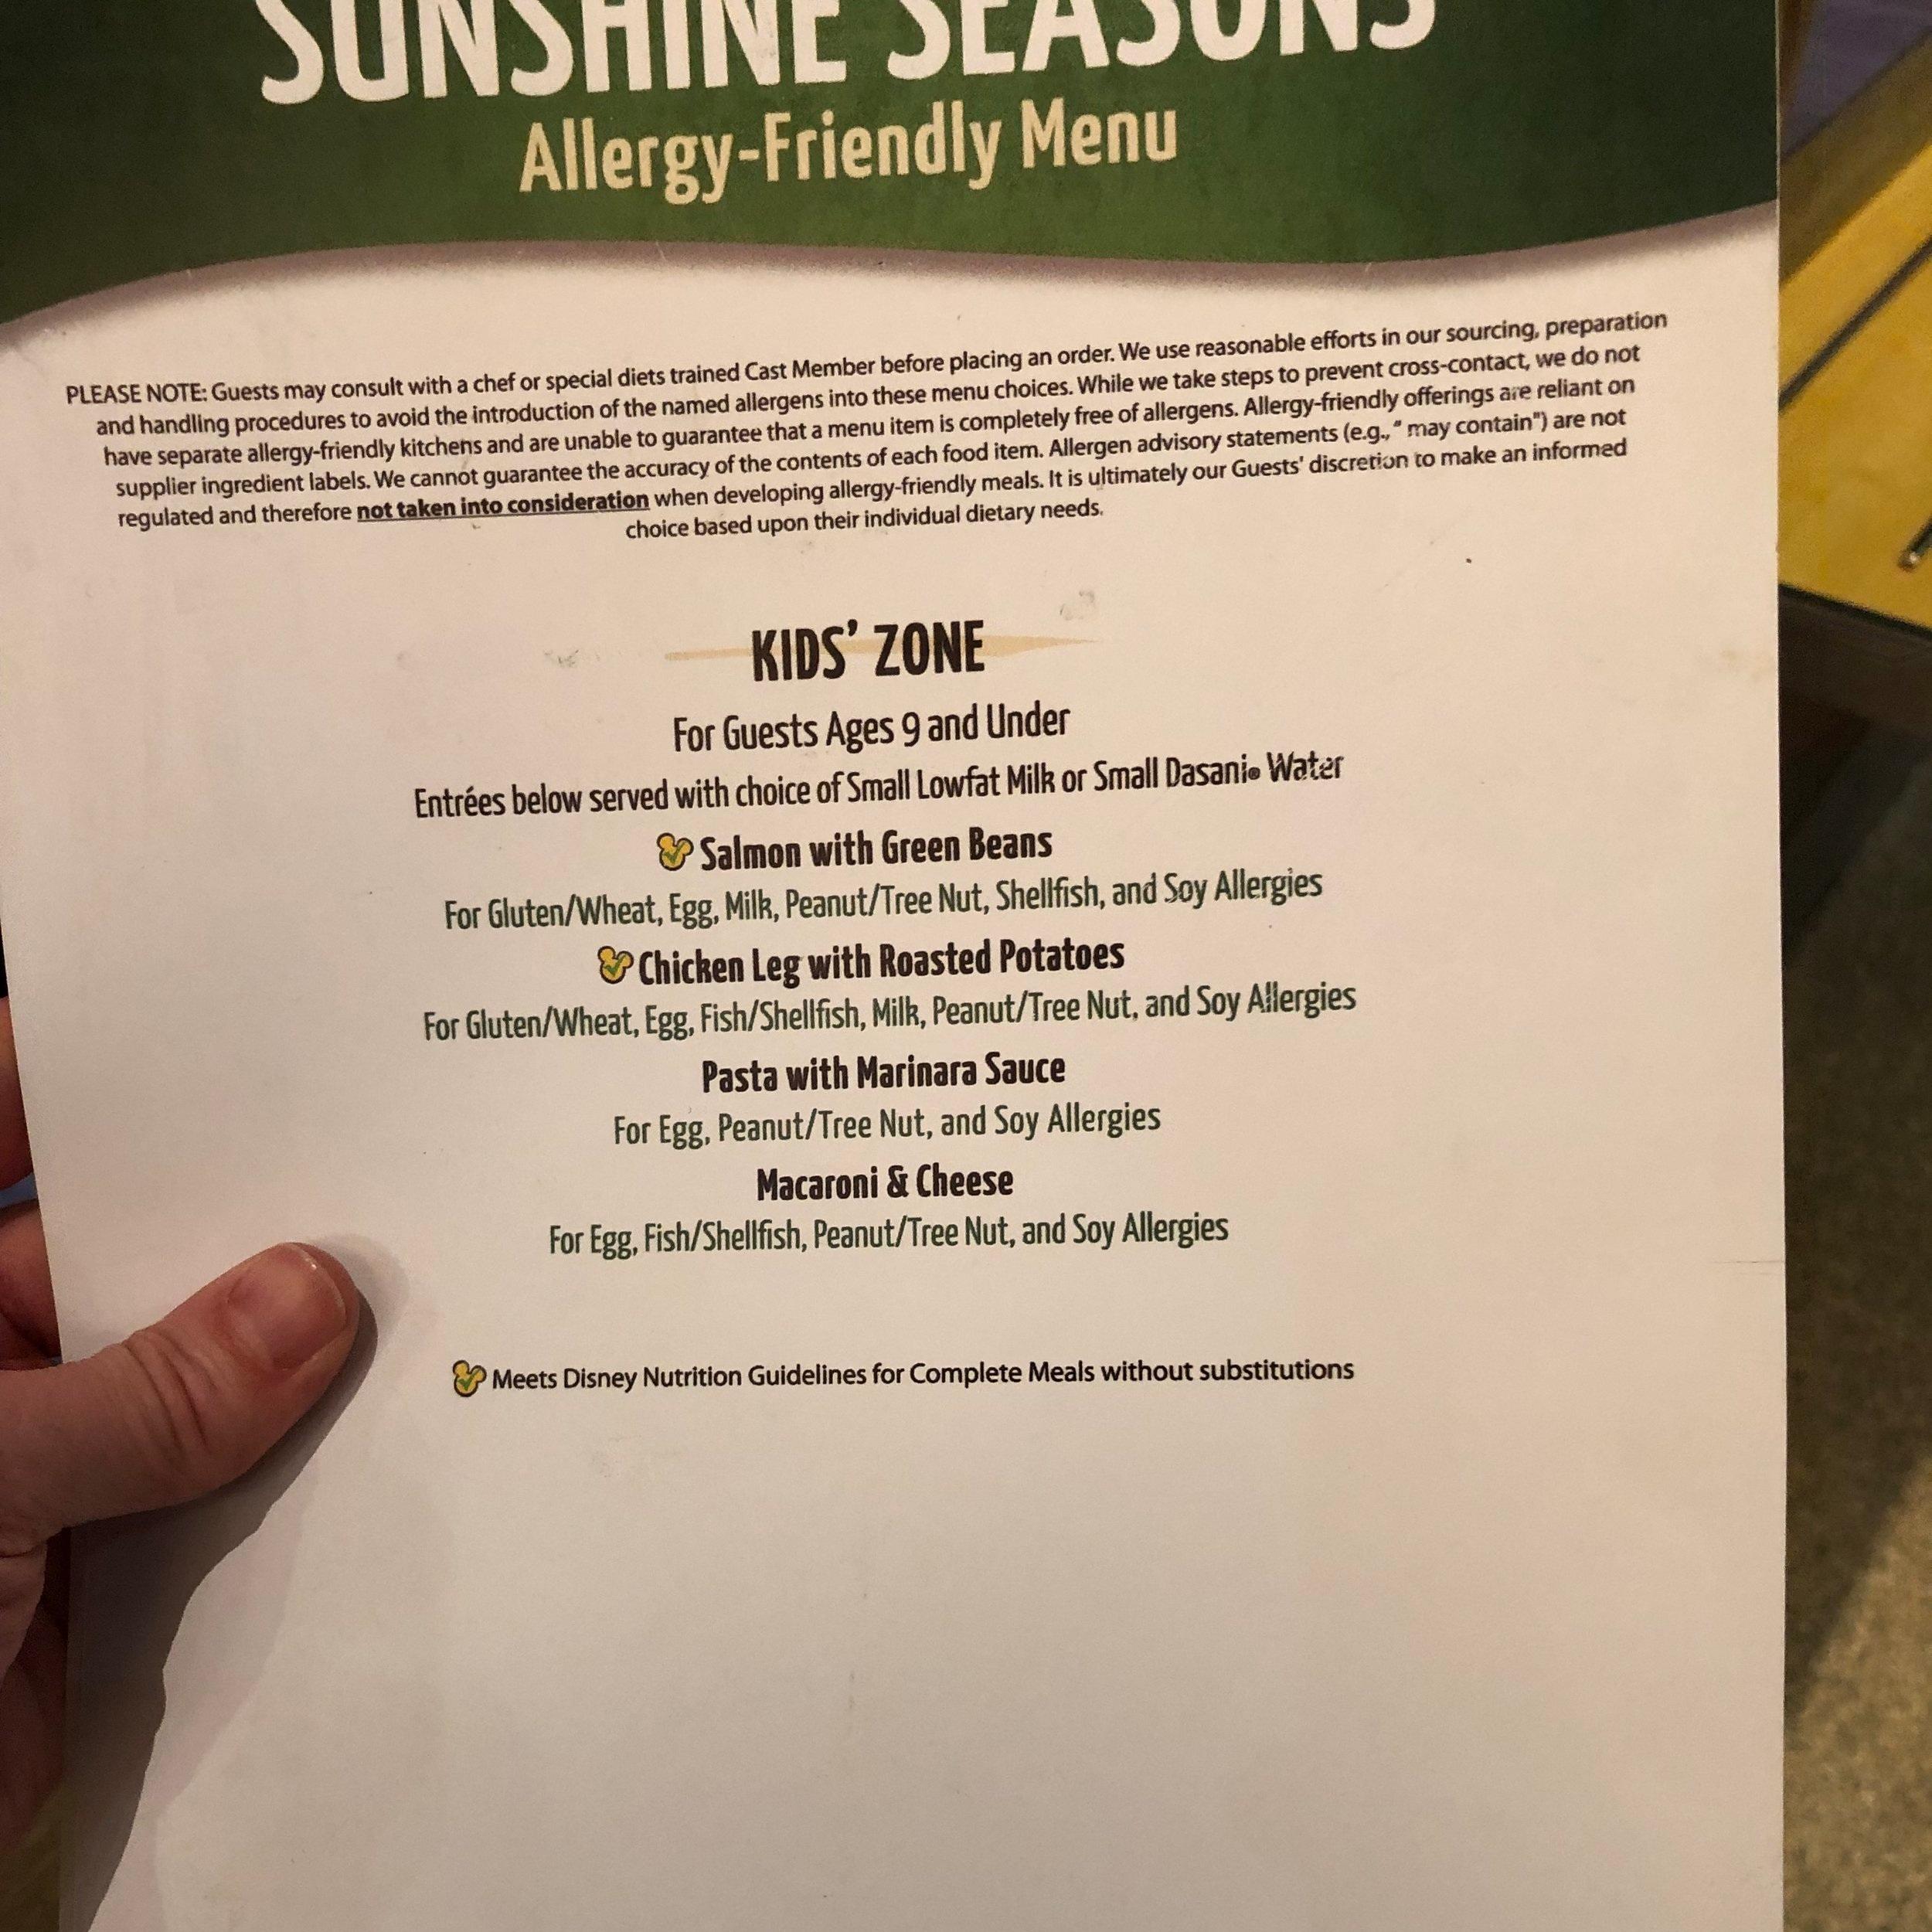 KIds Allergy Menu for Sunshine Seasons near Soarin' at Epcot